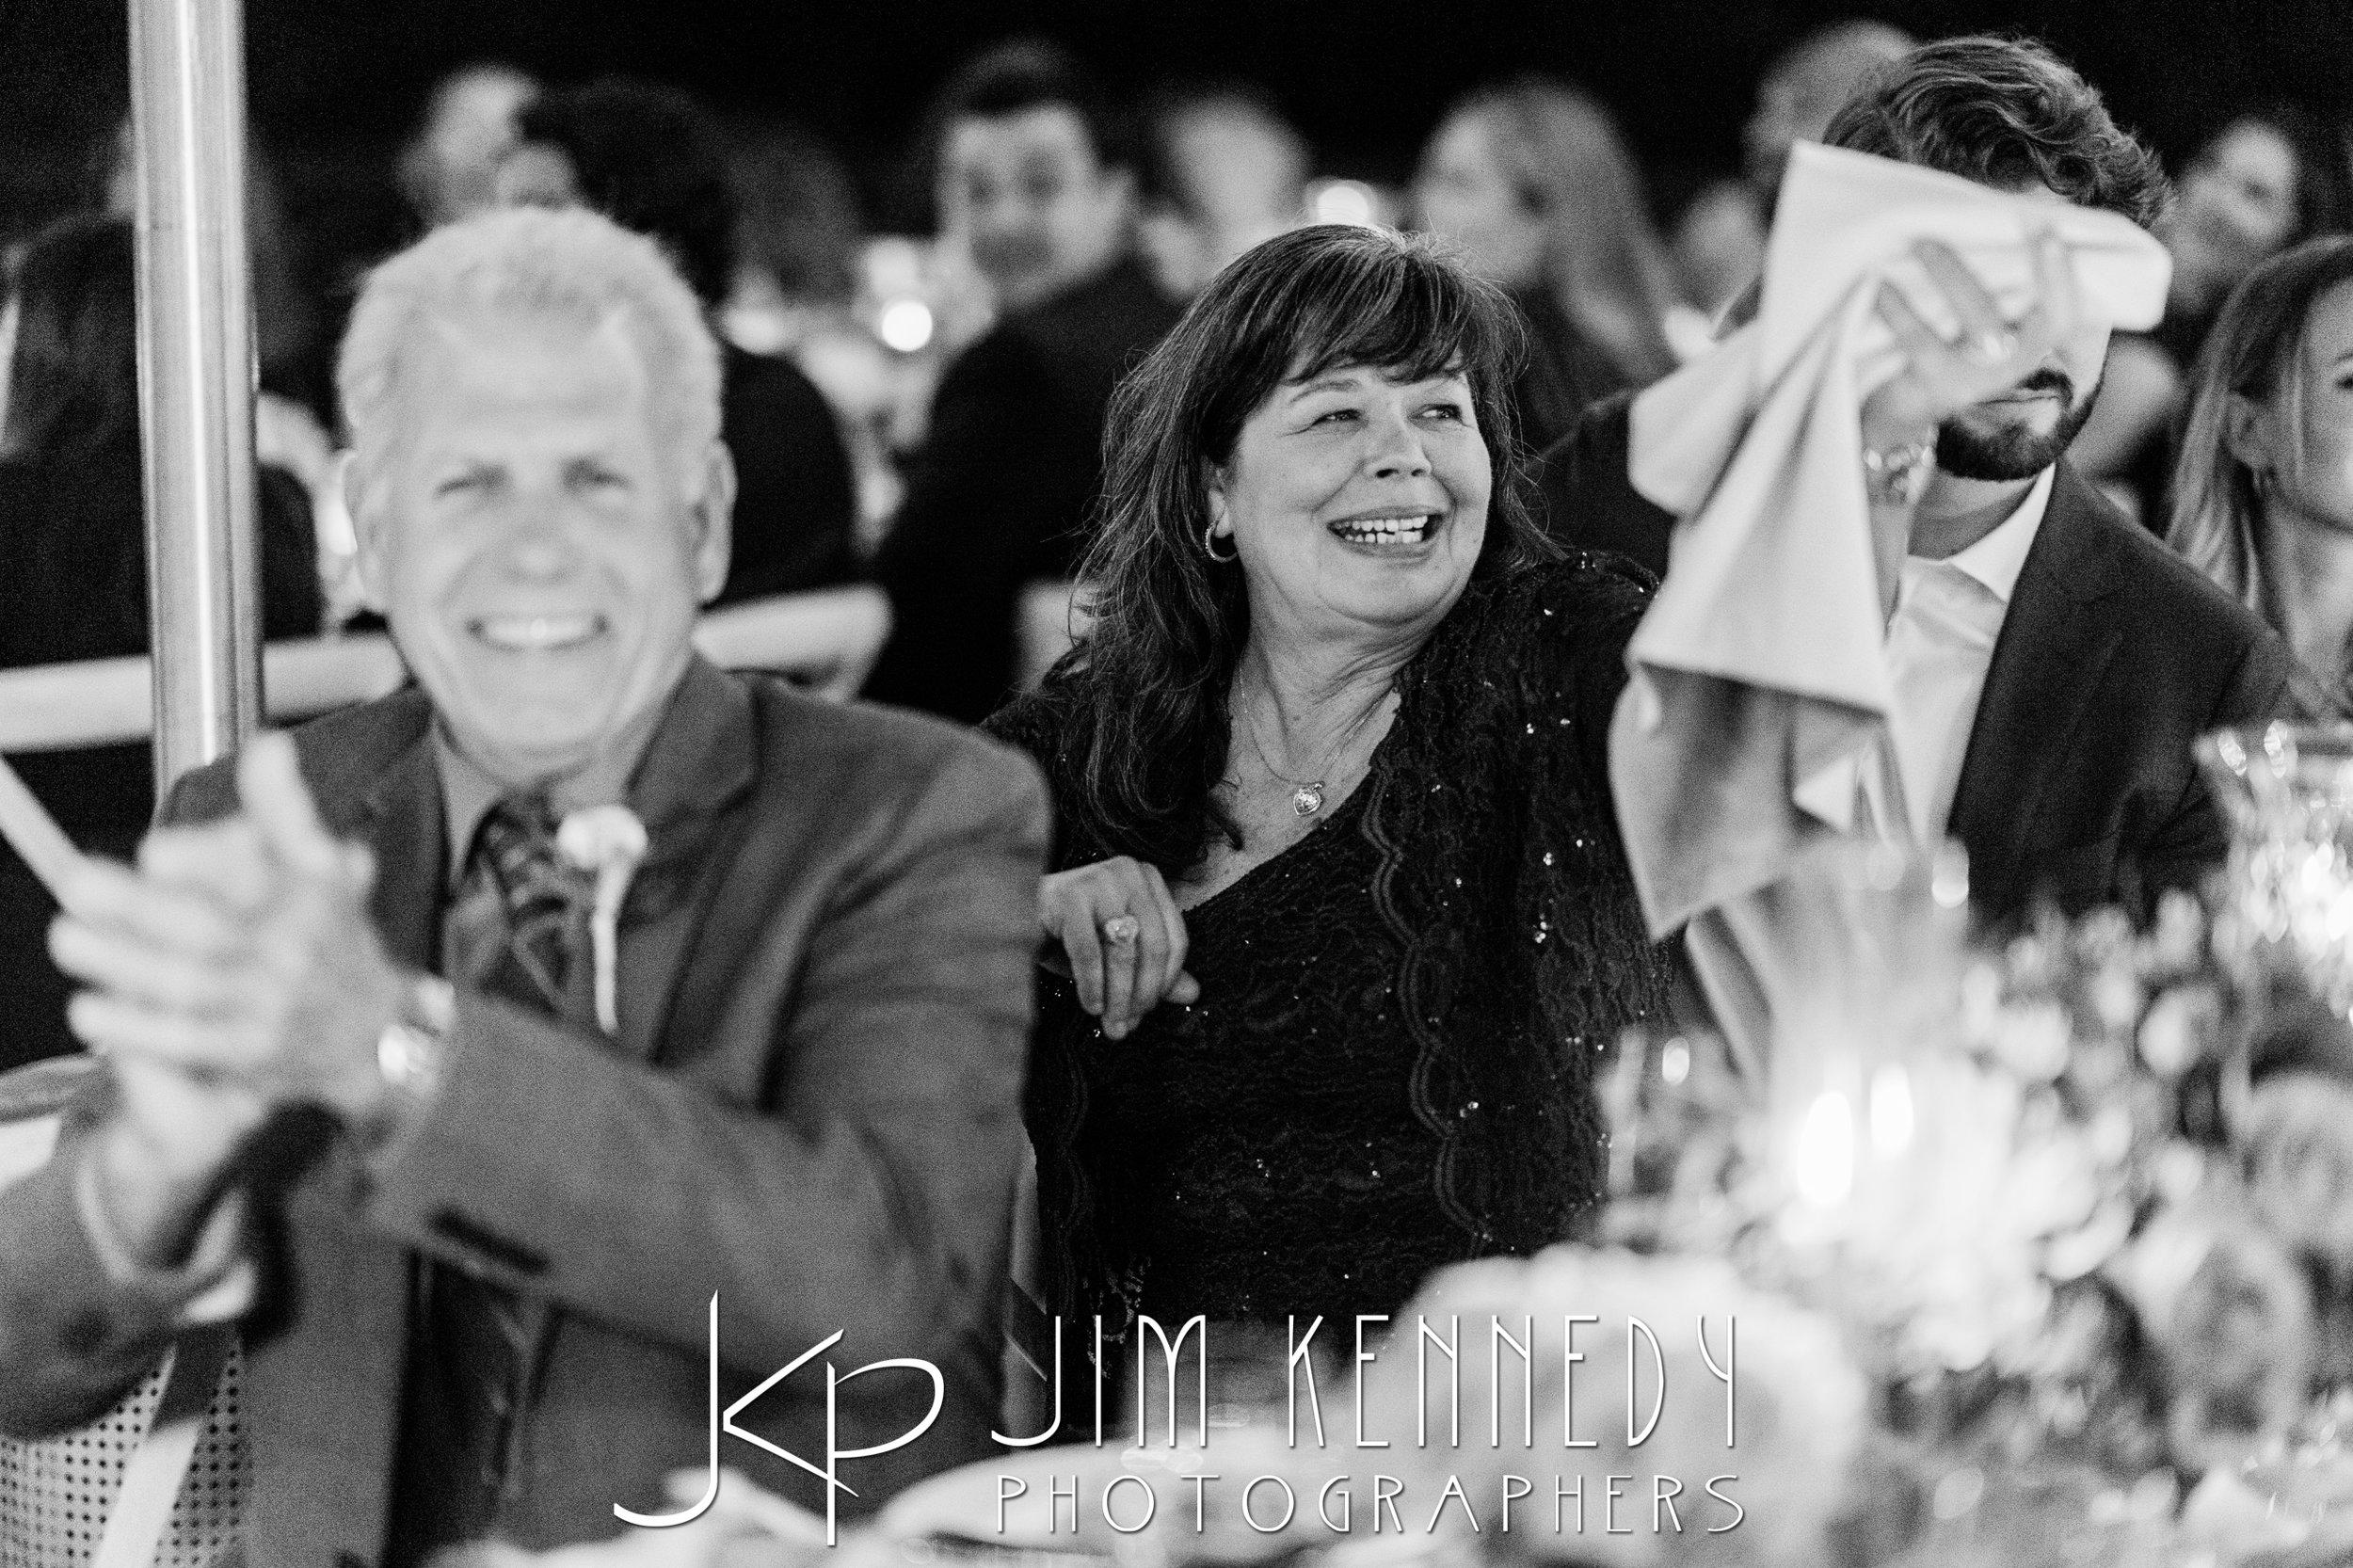 pelican-hill-wedding-jim-kenedy-photographers_0240.JPG